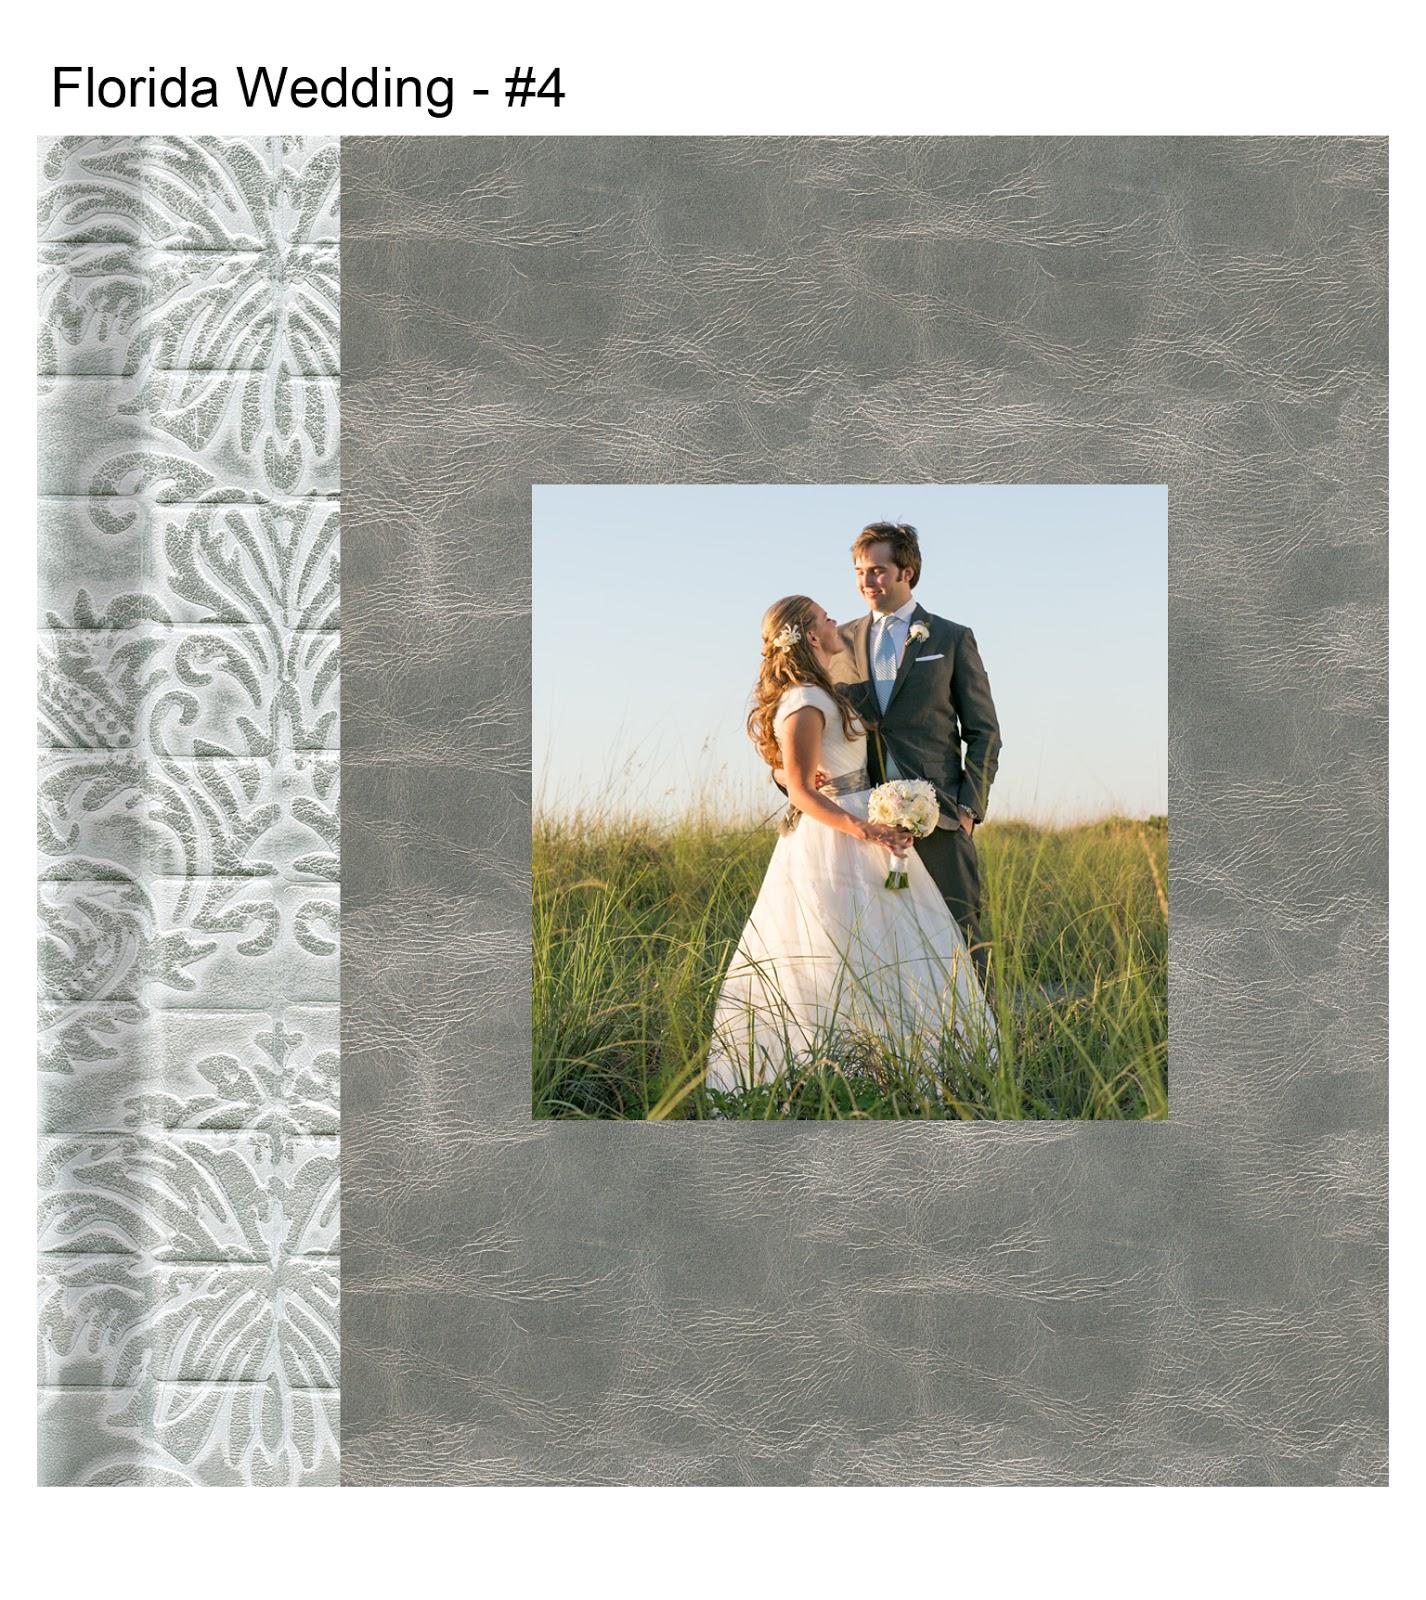 OpieFoto: Emily And John's Wedding Album Cover